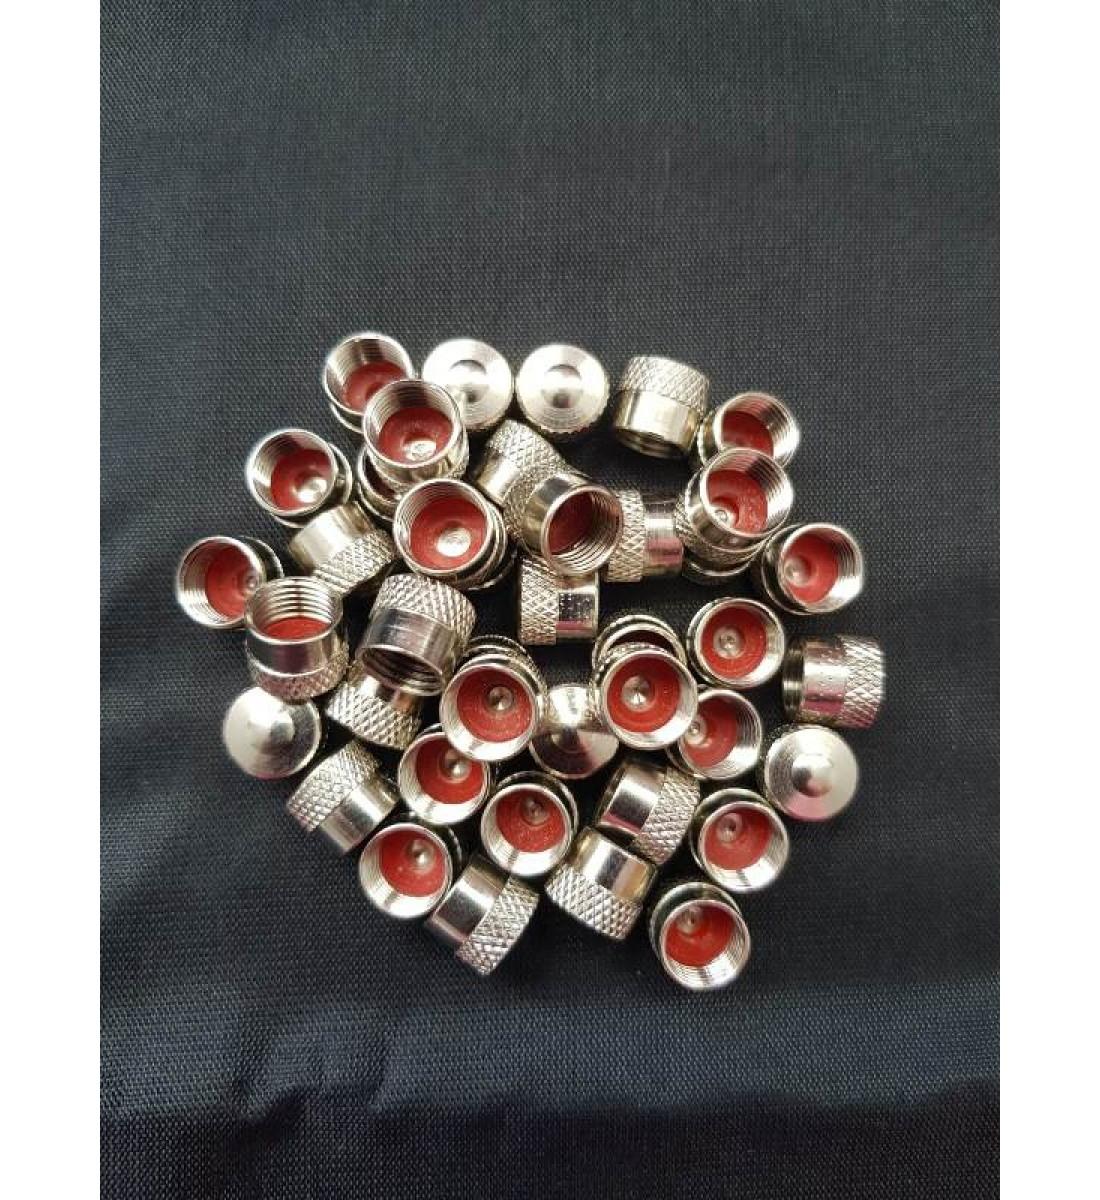 Capacele metal